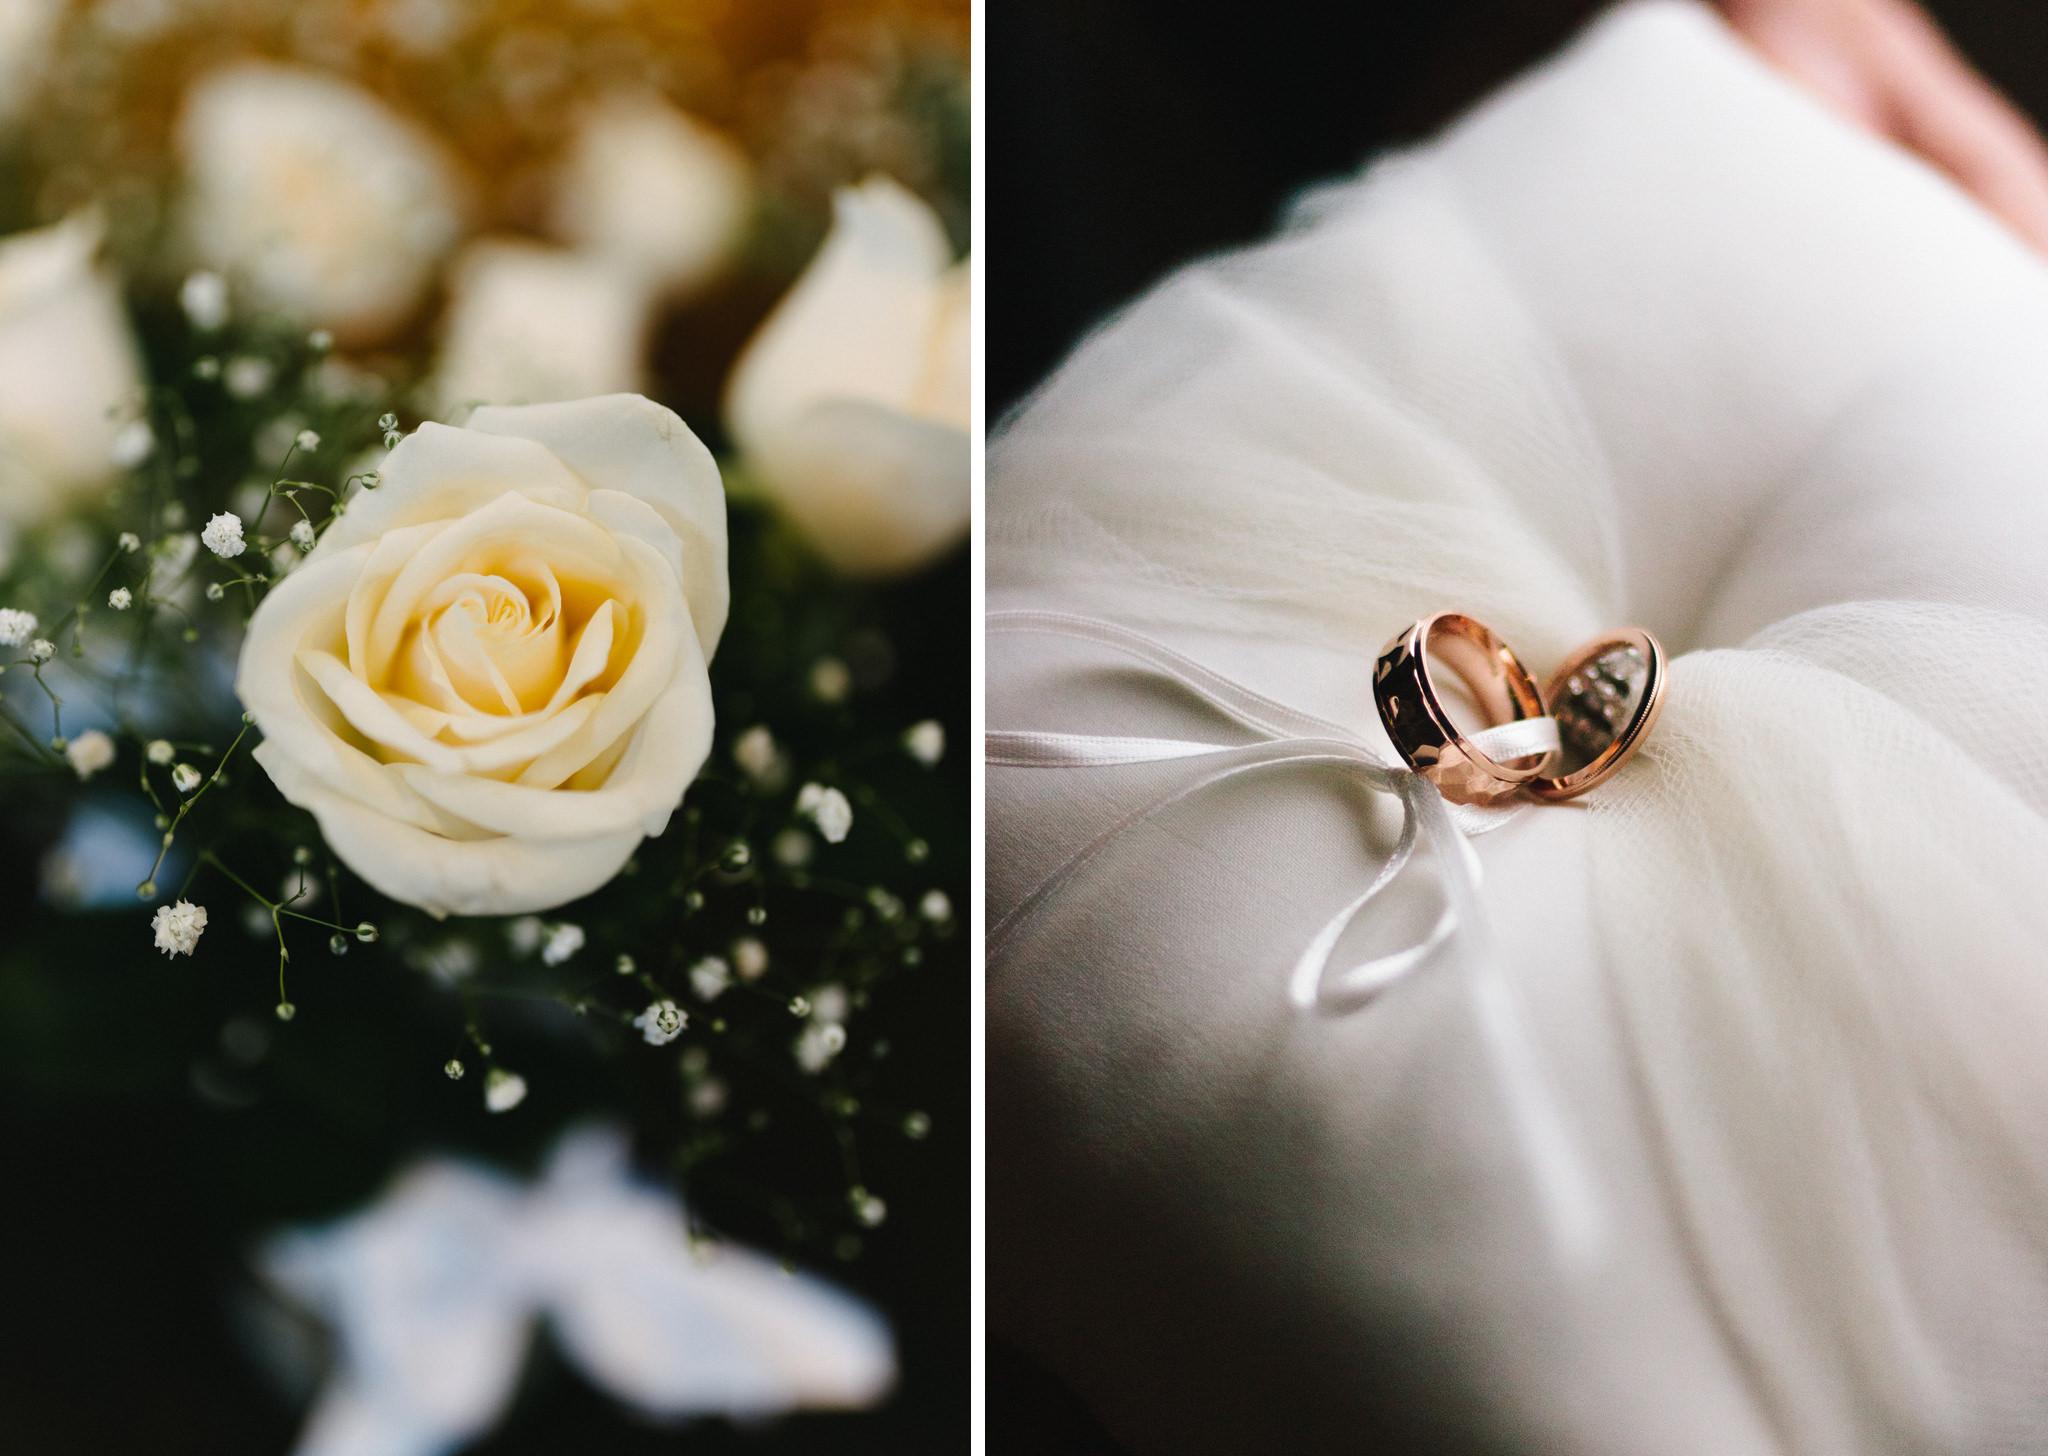 011-rempel-photography-chicago-wedding-inspiration-susan-daniel-michigan-metro-detroit-christian-church-holly-vault-cupcakes-and-kisses.jpg